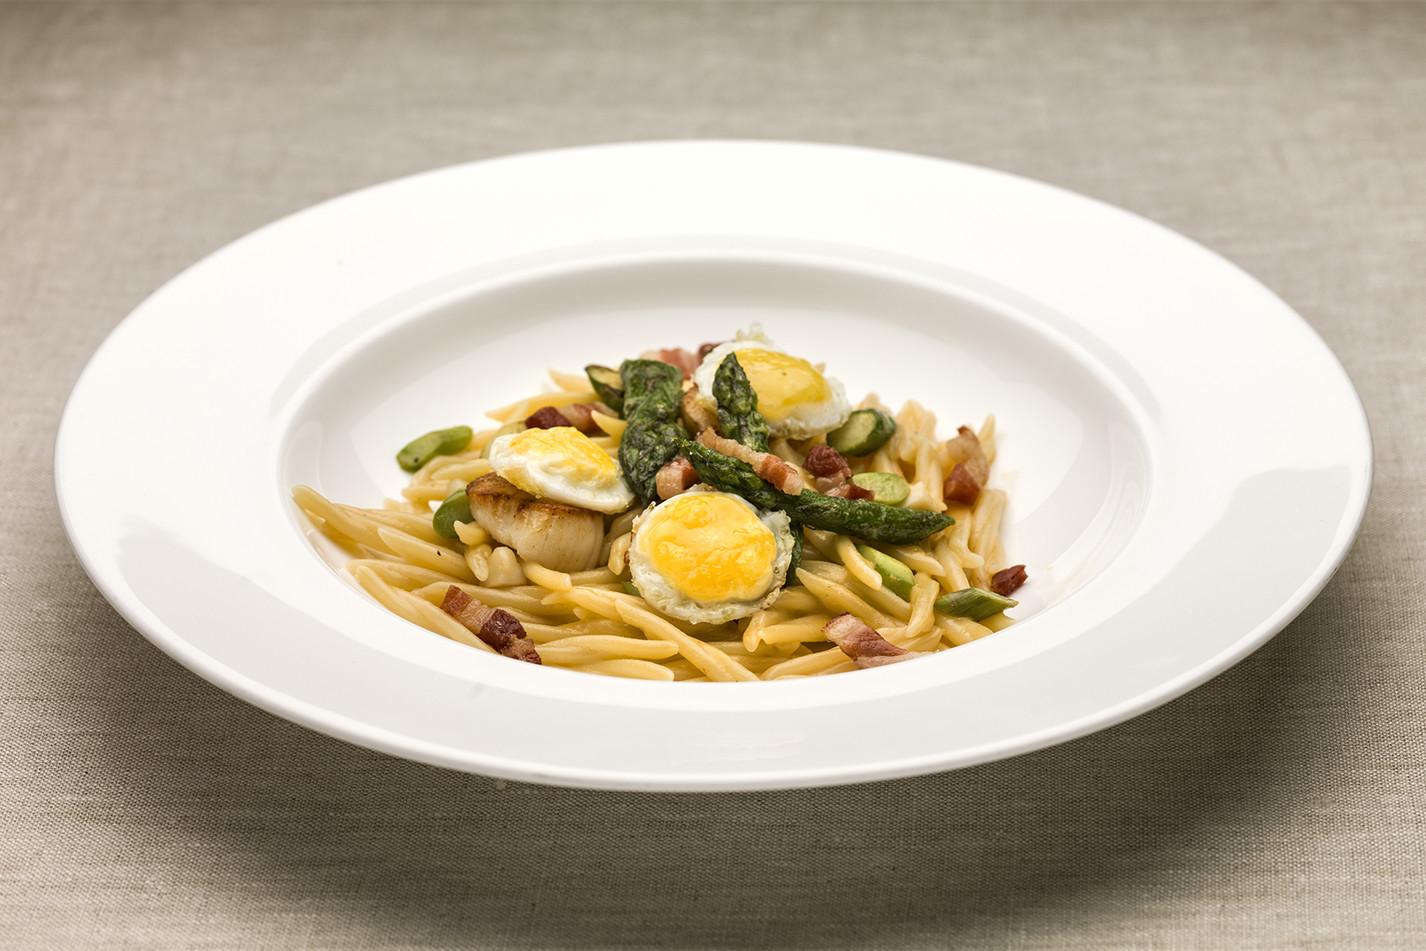 Yoshi Yamada, Japan – Trofie with pan-fried scallops, pancetta, asparagus and quail eggs